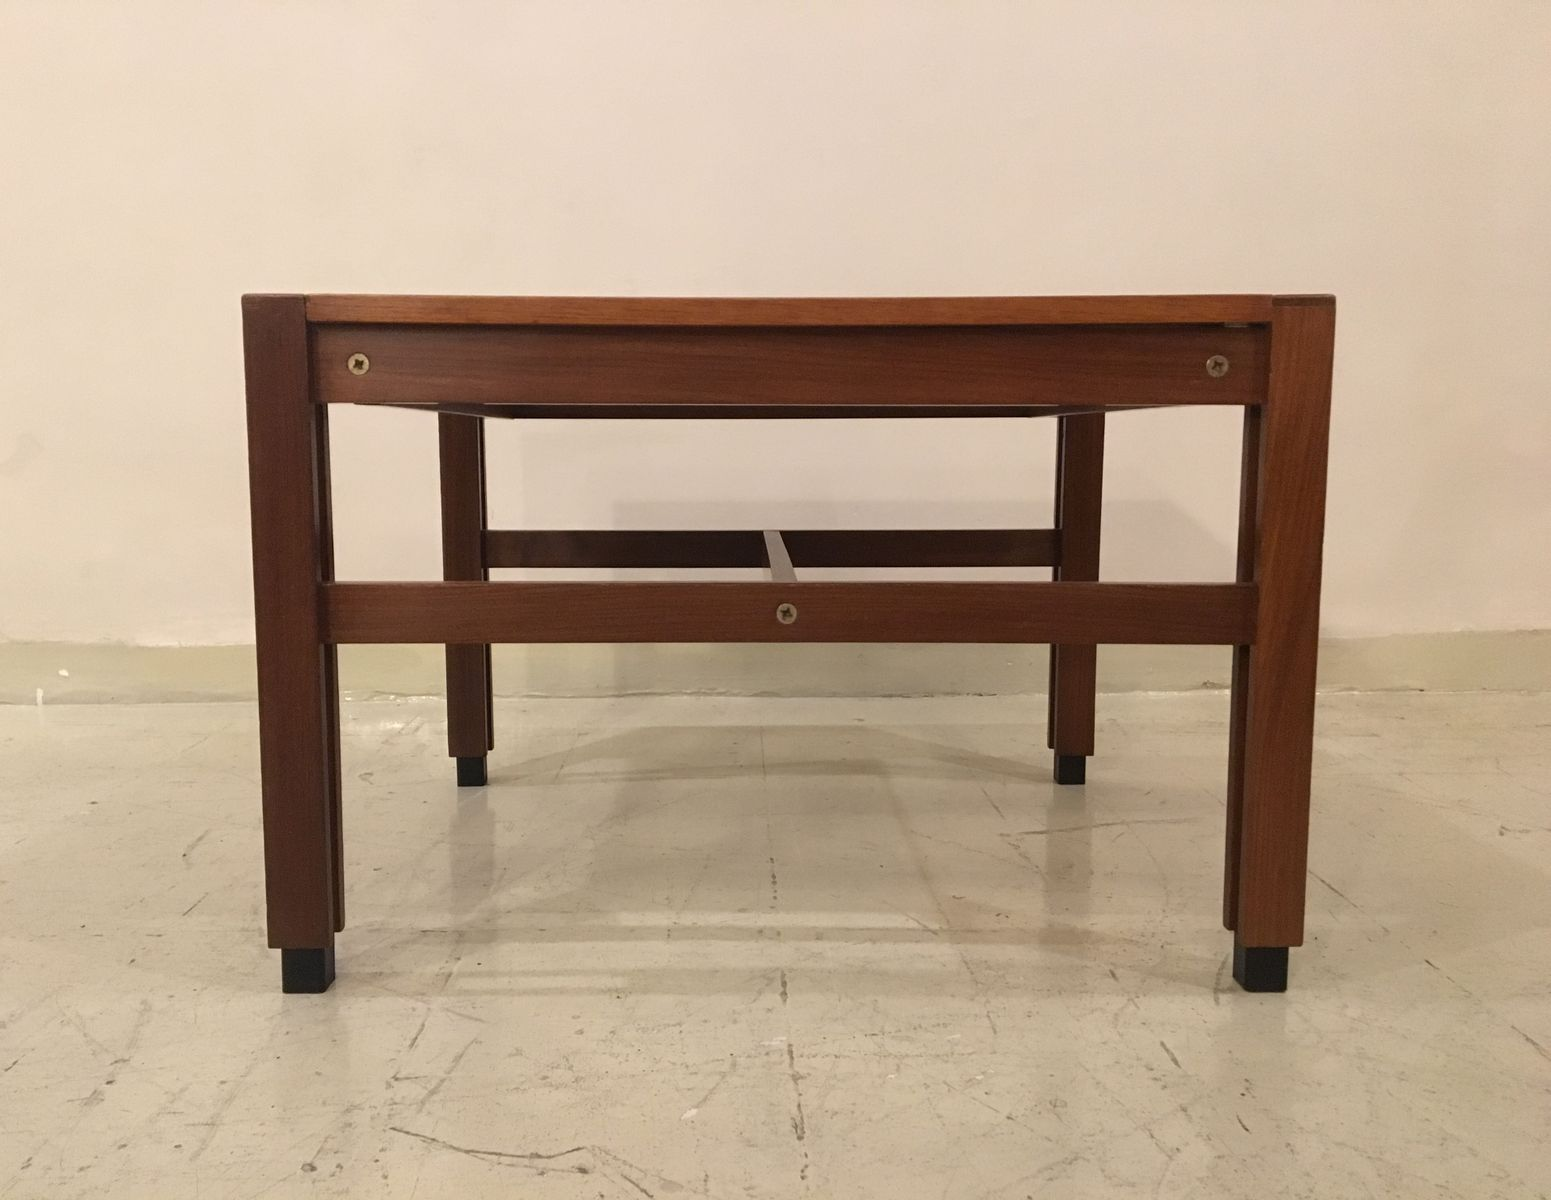 Design Di Mobili Italiani : Arona low table by ico luisa parisi for mim mobili italiani